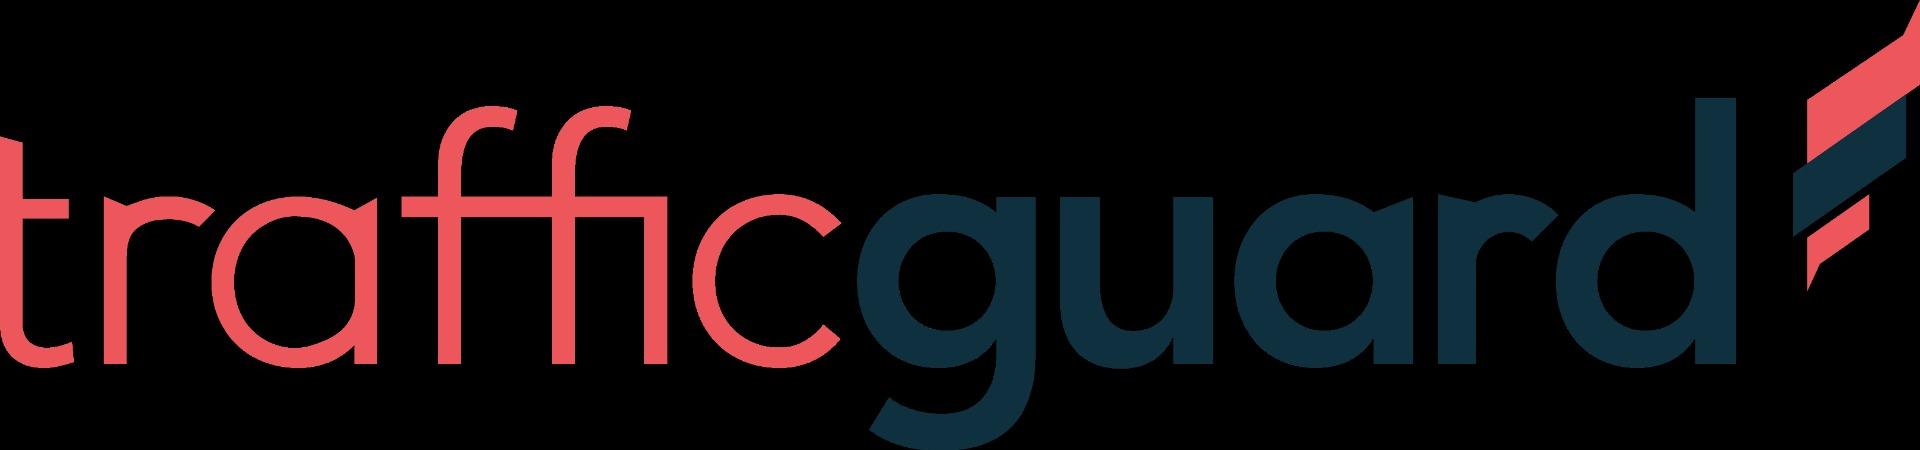 TrafficGuard Pty Ltd